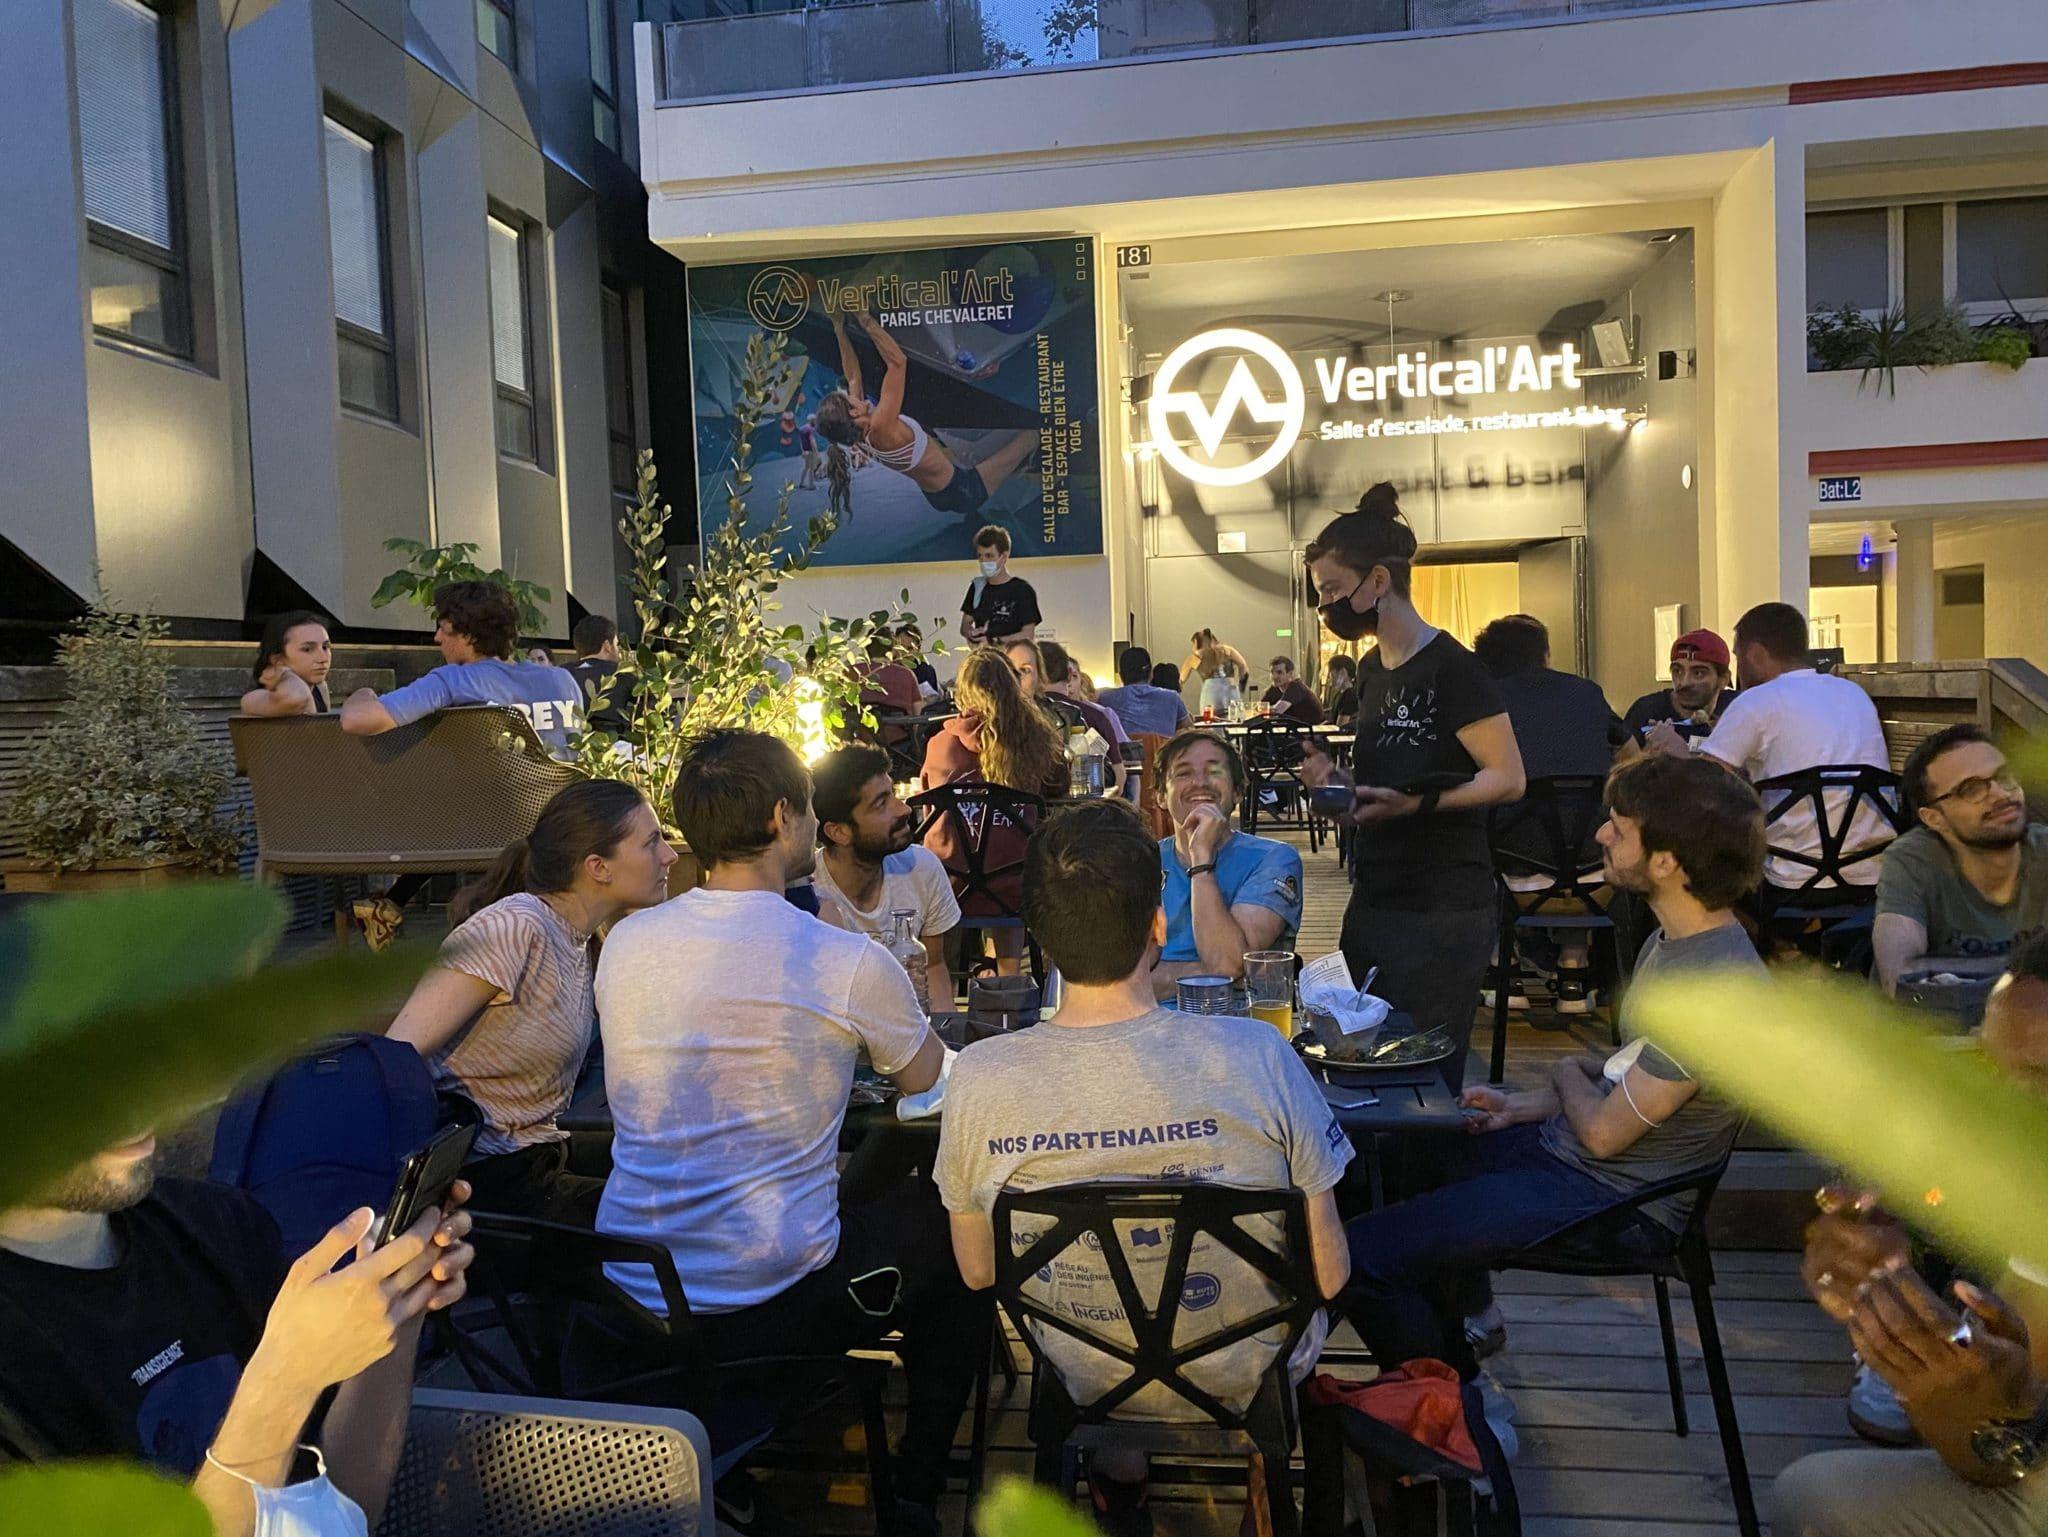 Terrasse restaurant Vertical'Art Paris Chevaleret - Salle d'escalade